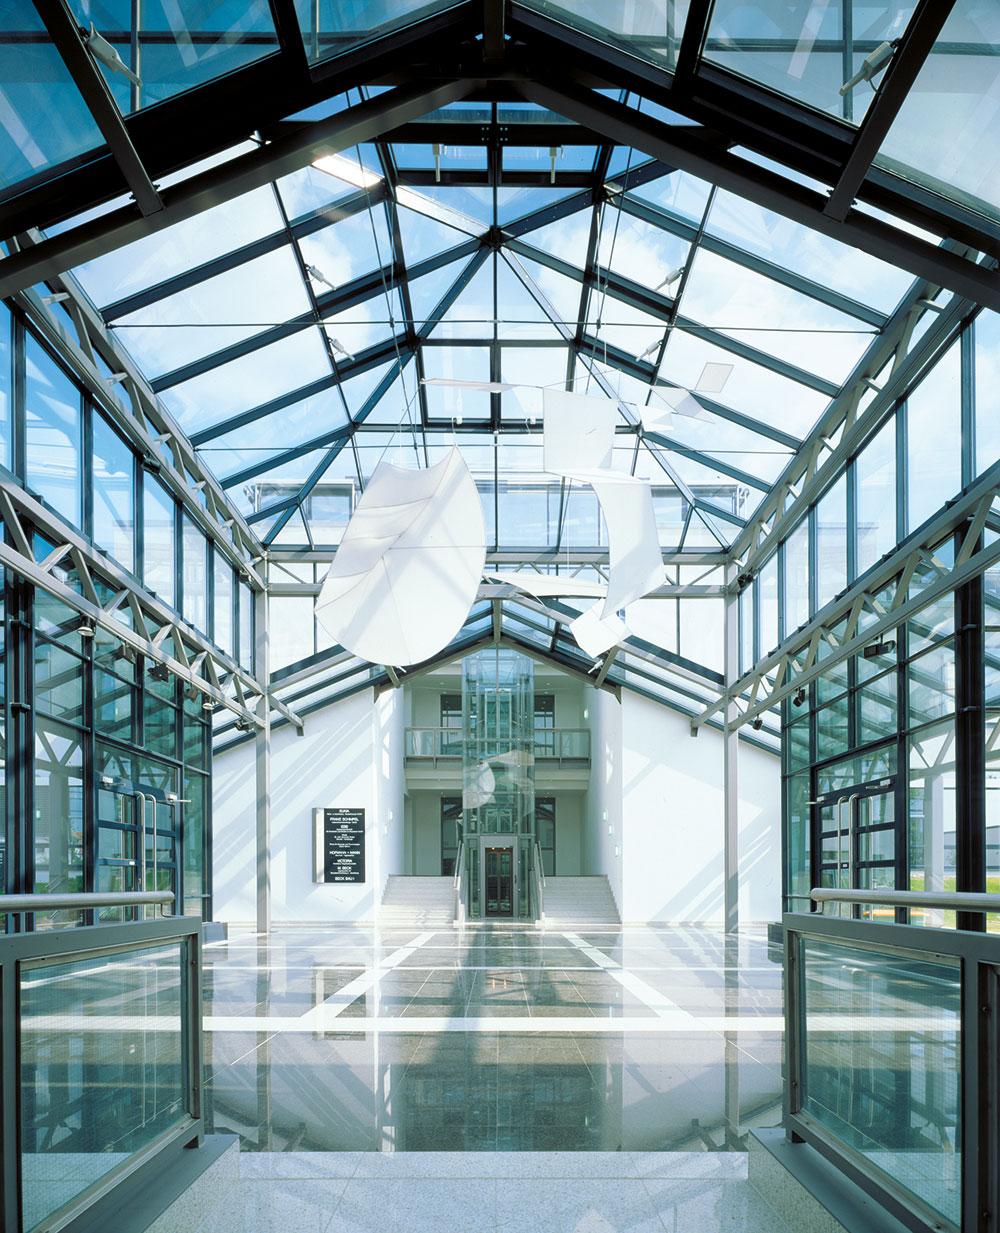 Foyer - Dr.-Gessler-Straße 37, Regensburg